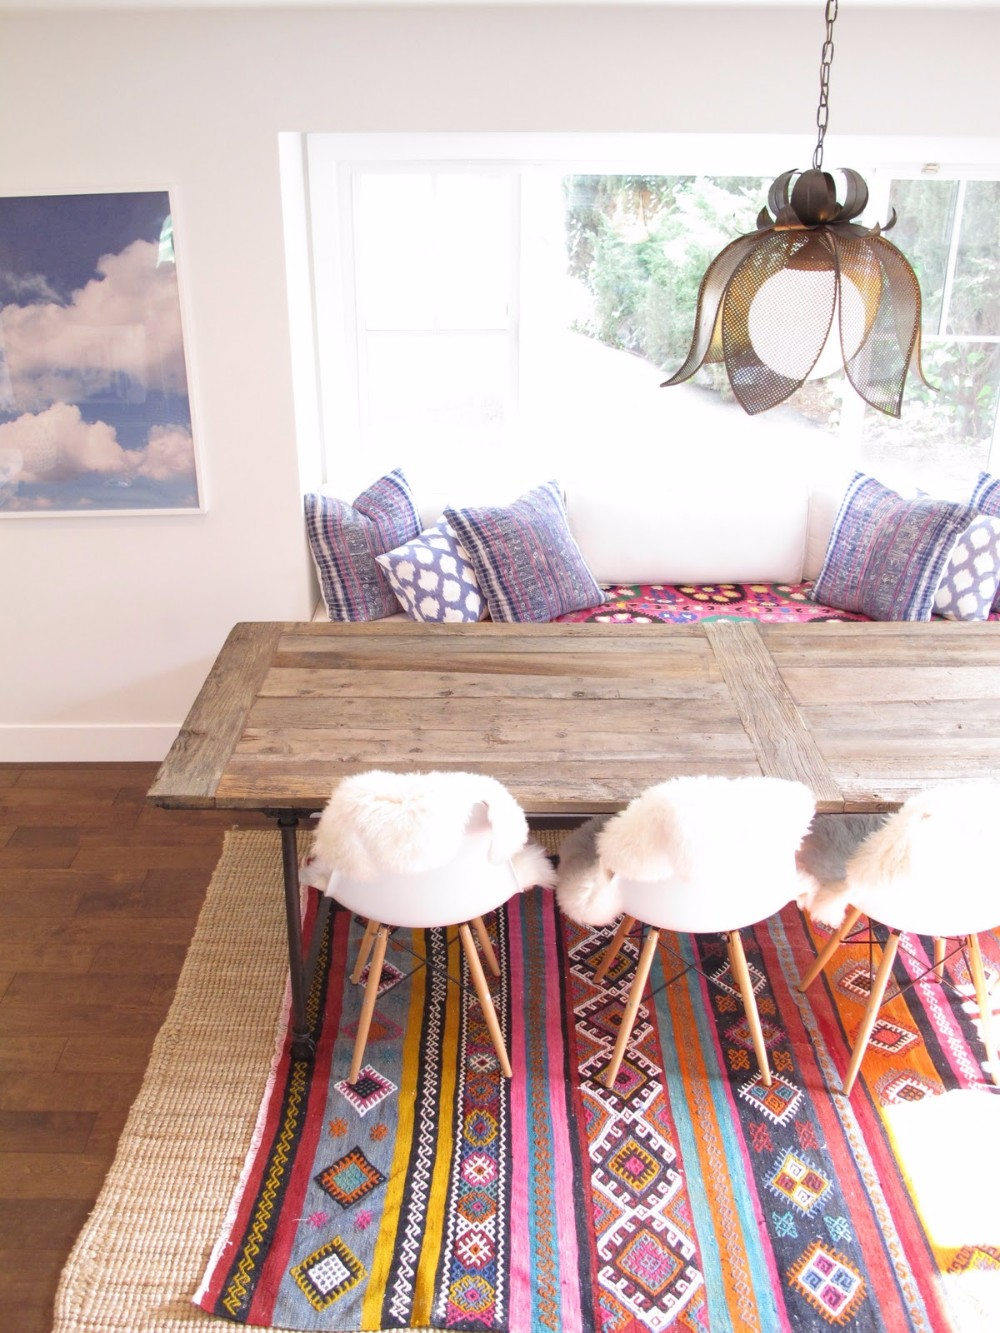 boho chic 25 Boho Chic Dining Room Designs That Will Inspire You 25 boho chic dining room designs that will inspire you 19